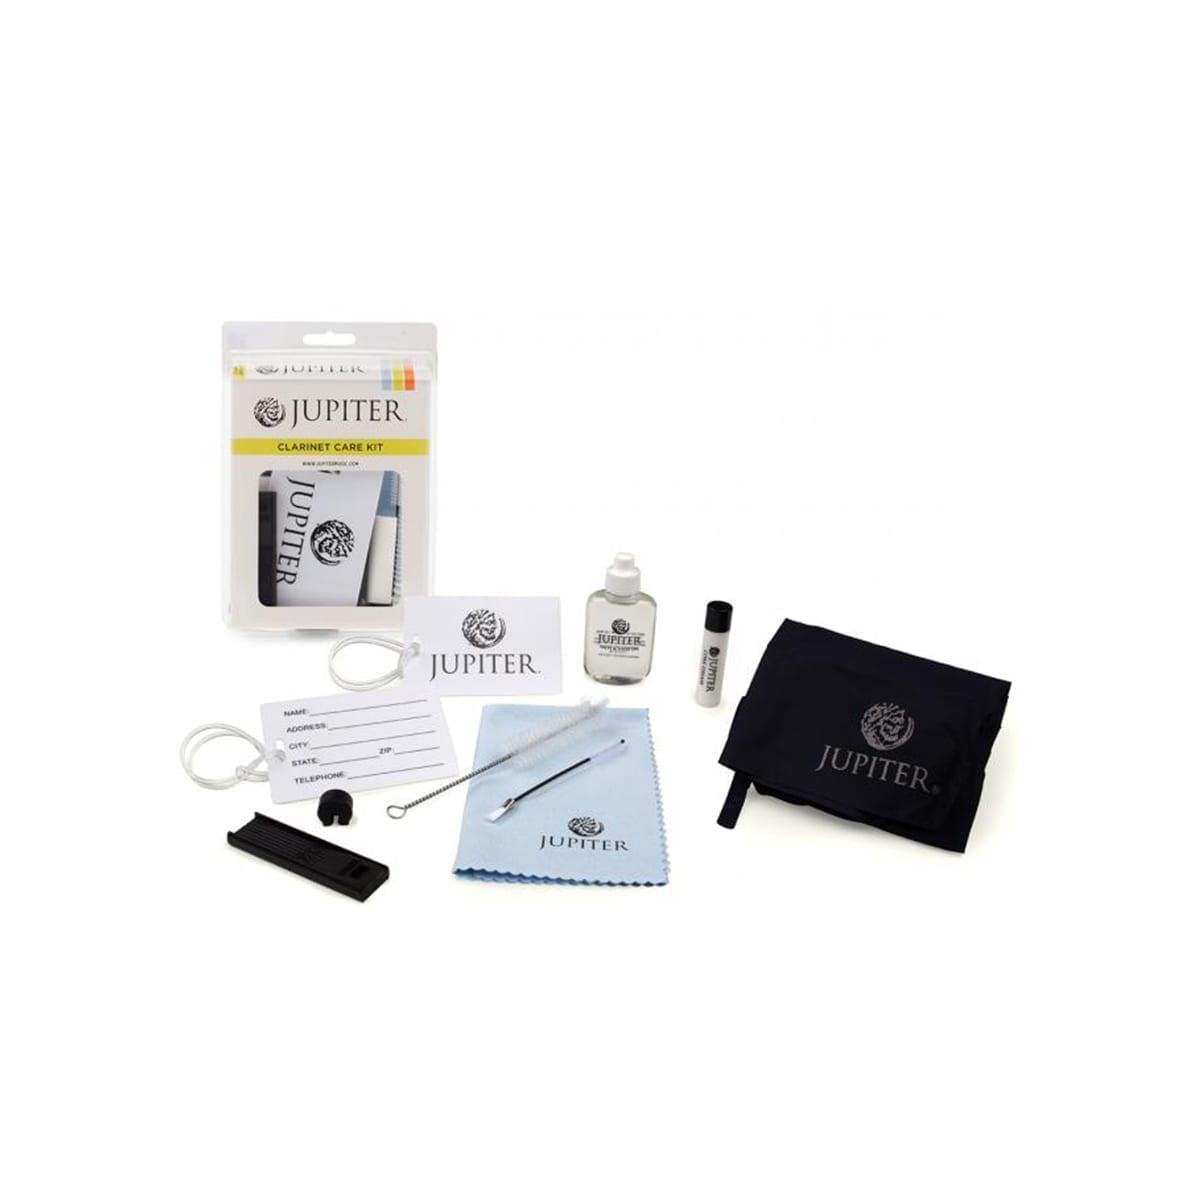 Jupiter Clarinet Care Kit